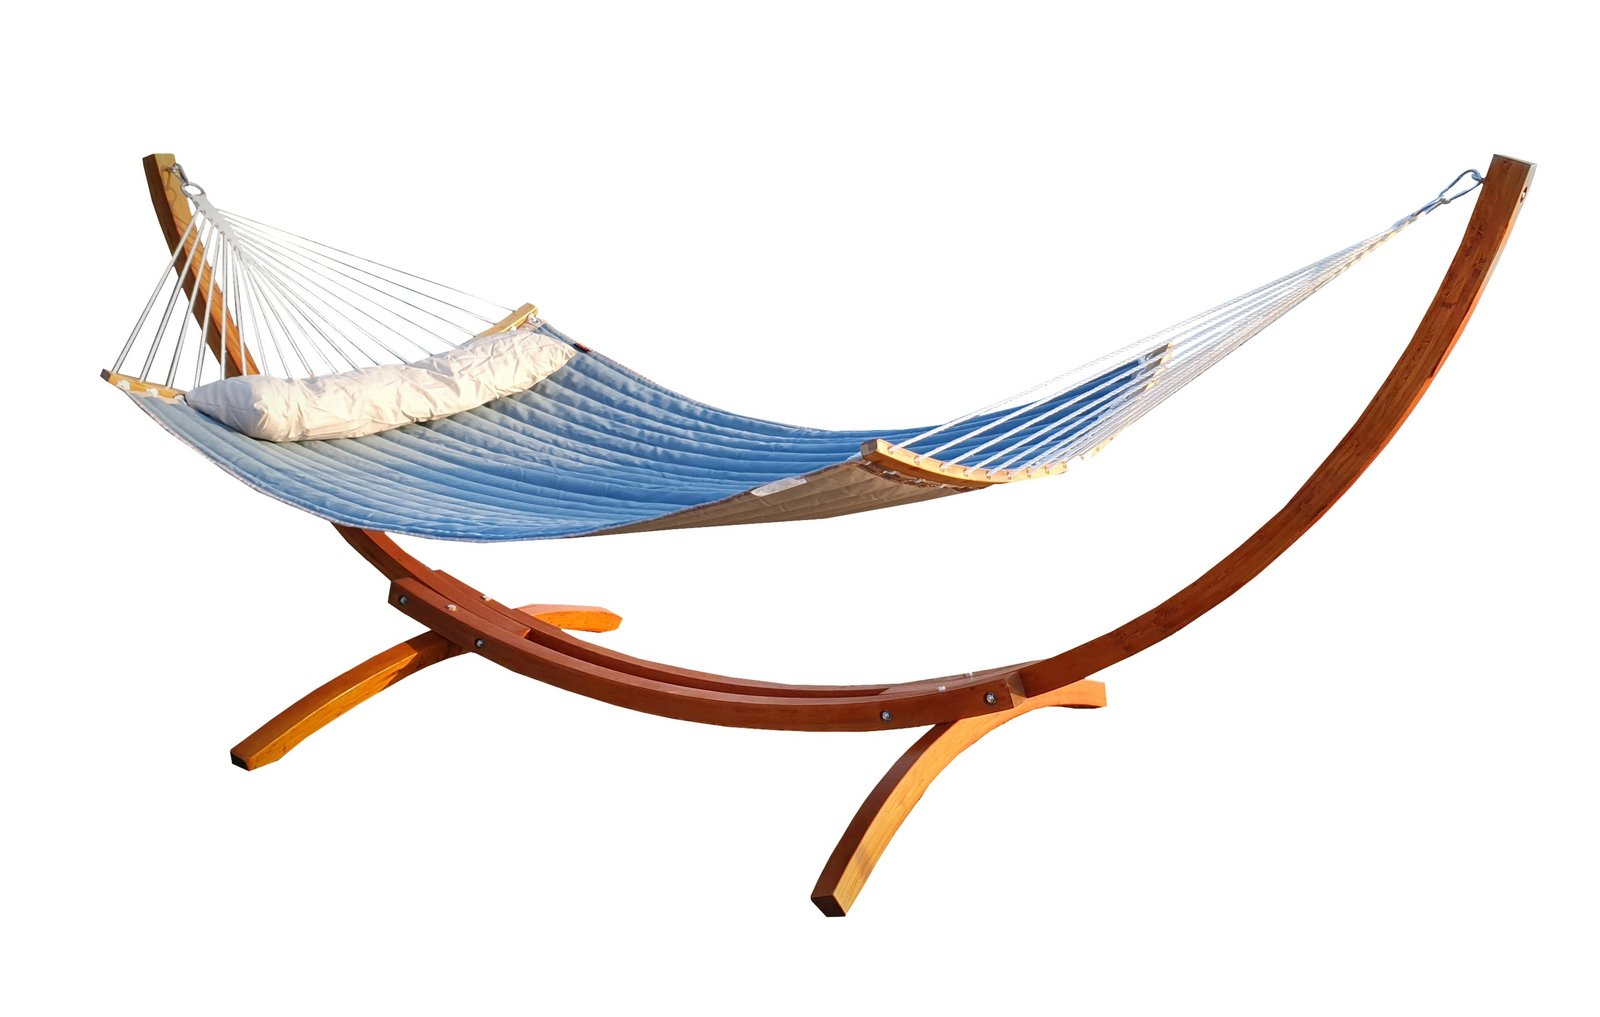 osoltus h ngematte xxl pulau mit holz gestell 360cm l rche. Black Bedroom Furniture Sets. Home Design Ideas